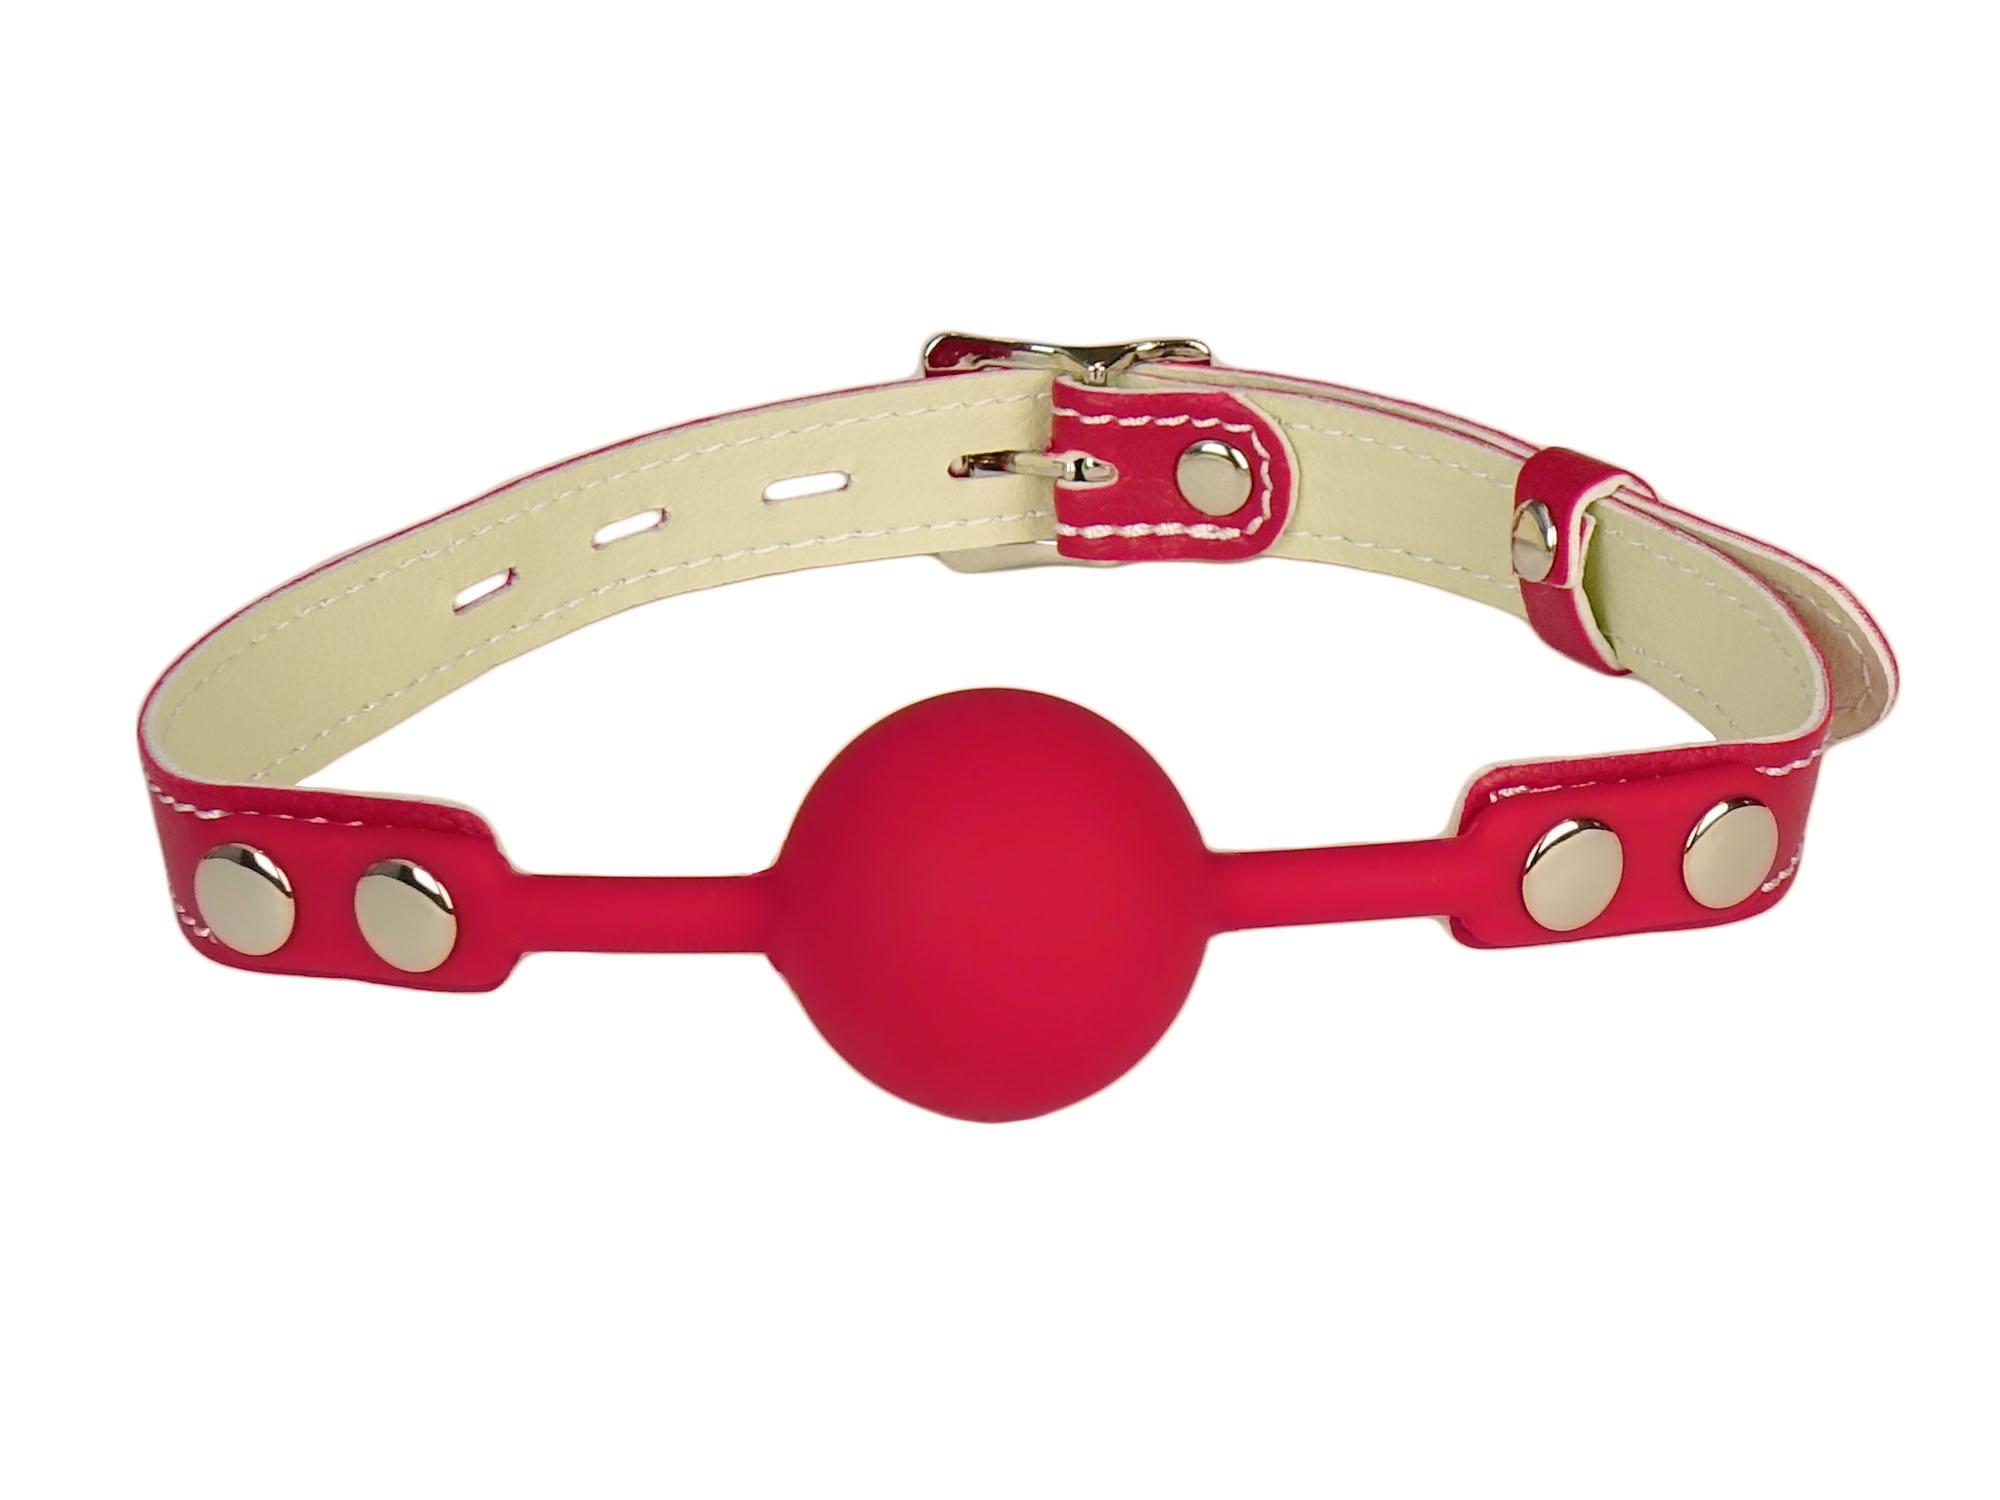 Komfort Silikon Knebel rot abschliessbar